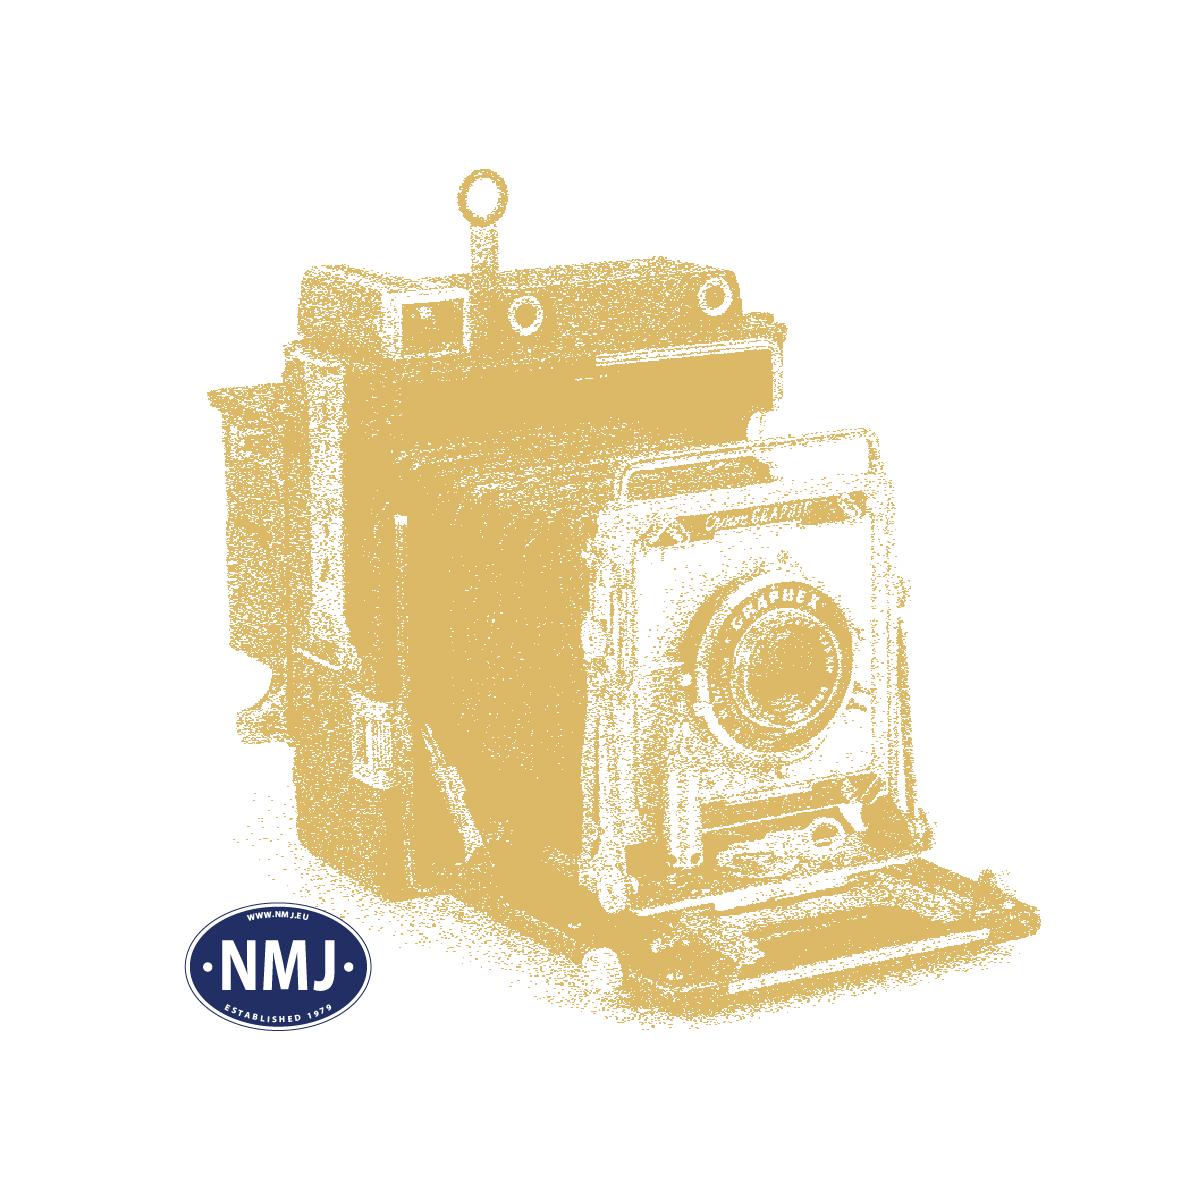 NMJT245402 - NMJ Topline SNCB 202003, 0-Skala, DCC m/ Lyd